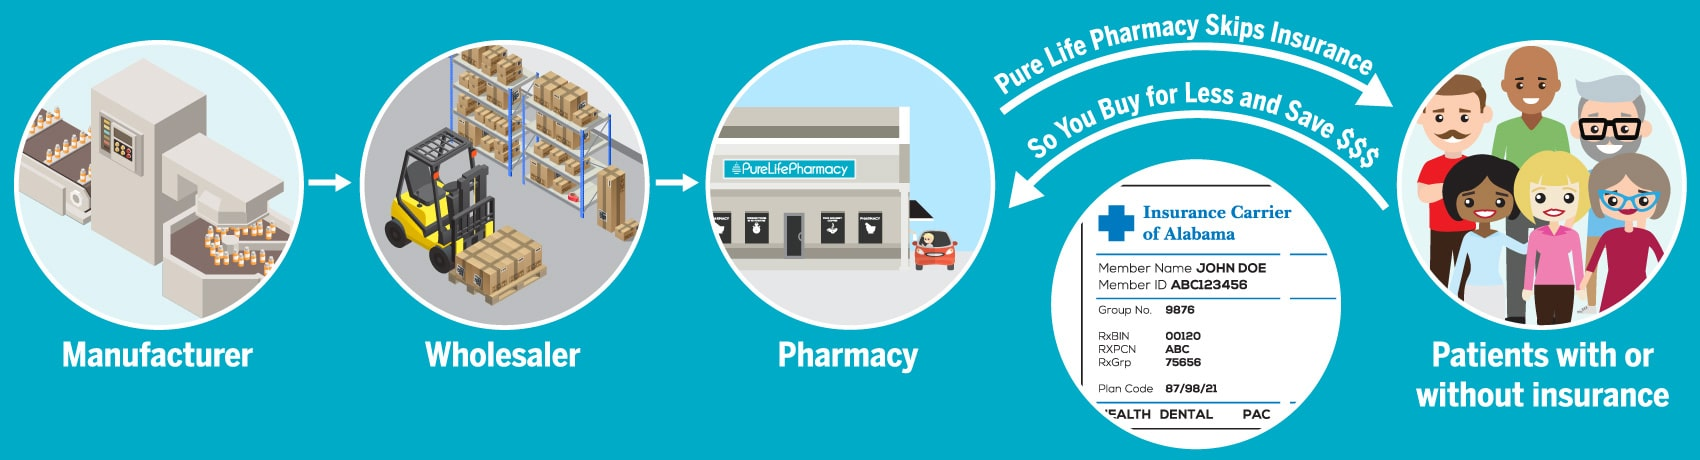 no-insurance-medicine-pure-life-compounding-pharmacy-alabama-daphne-fairhope-foley-mobile-alabama